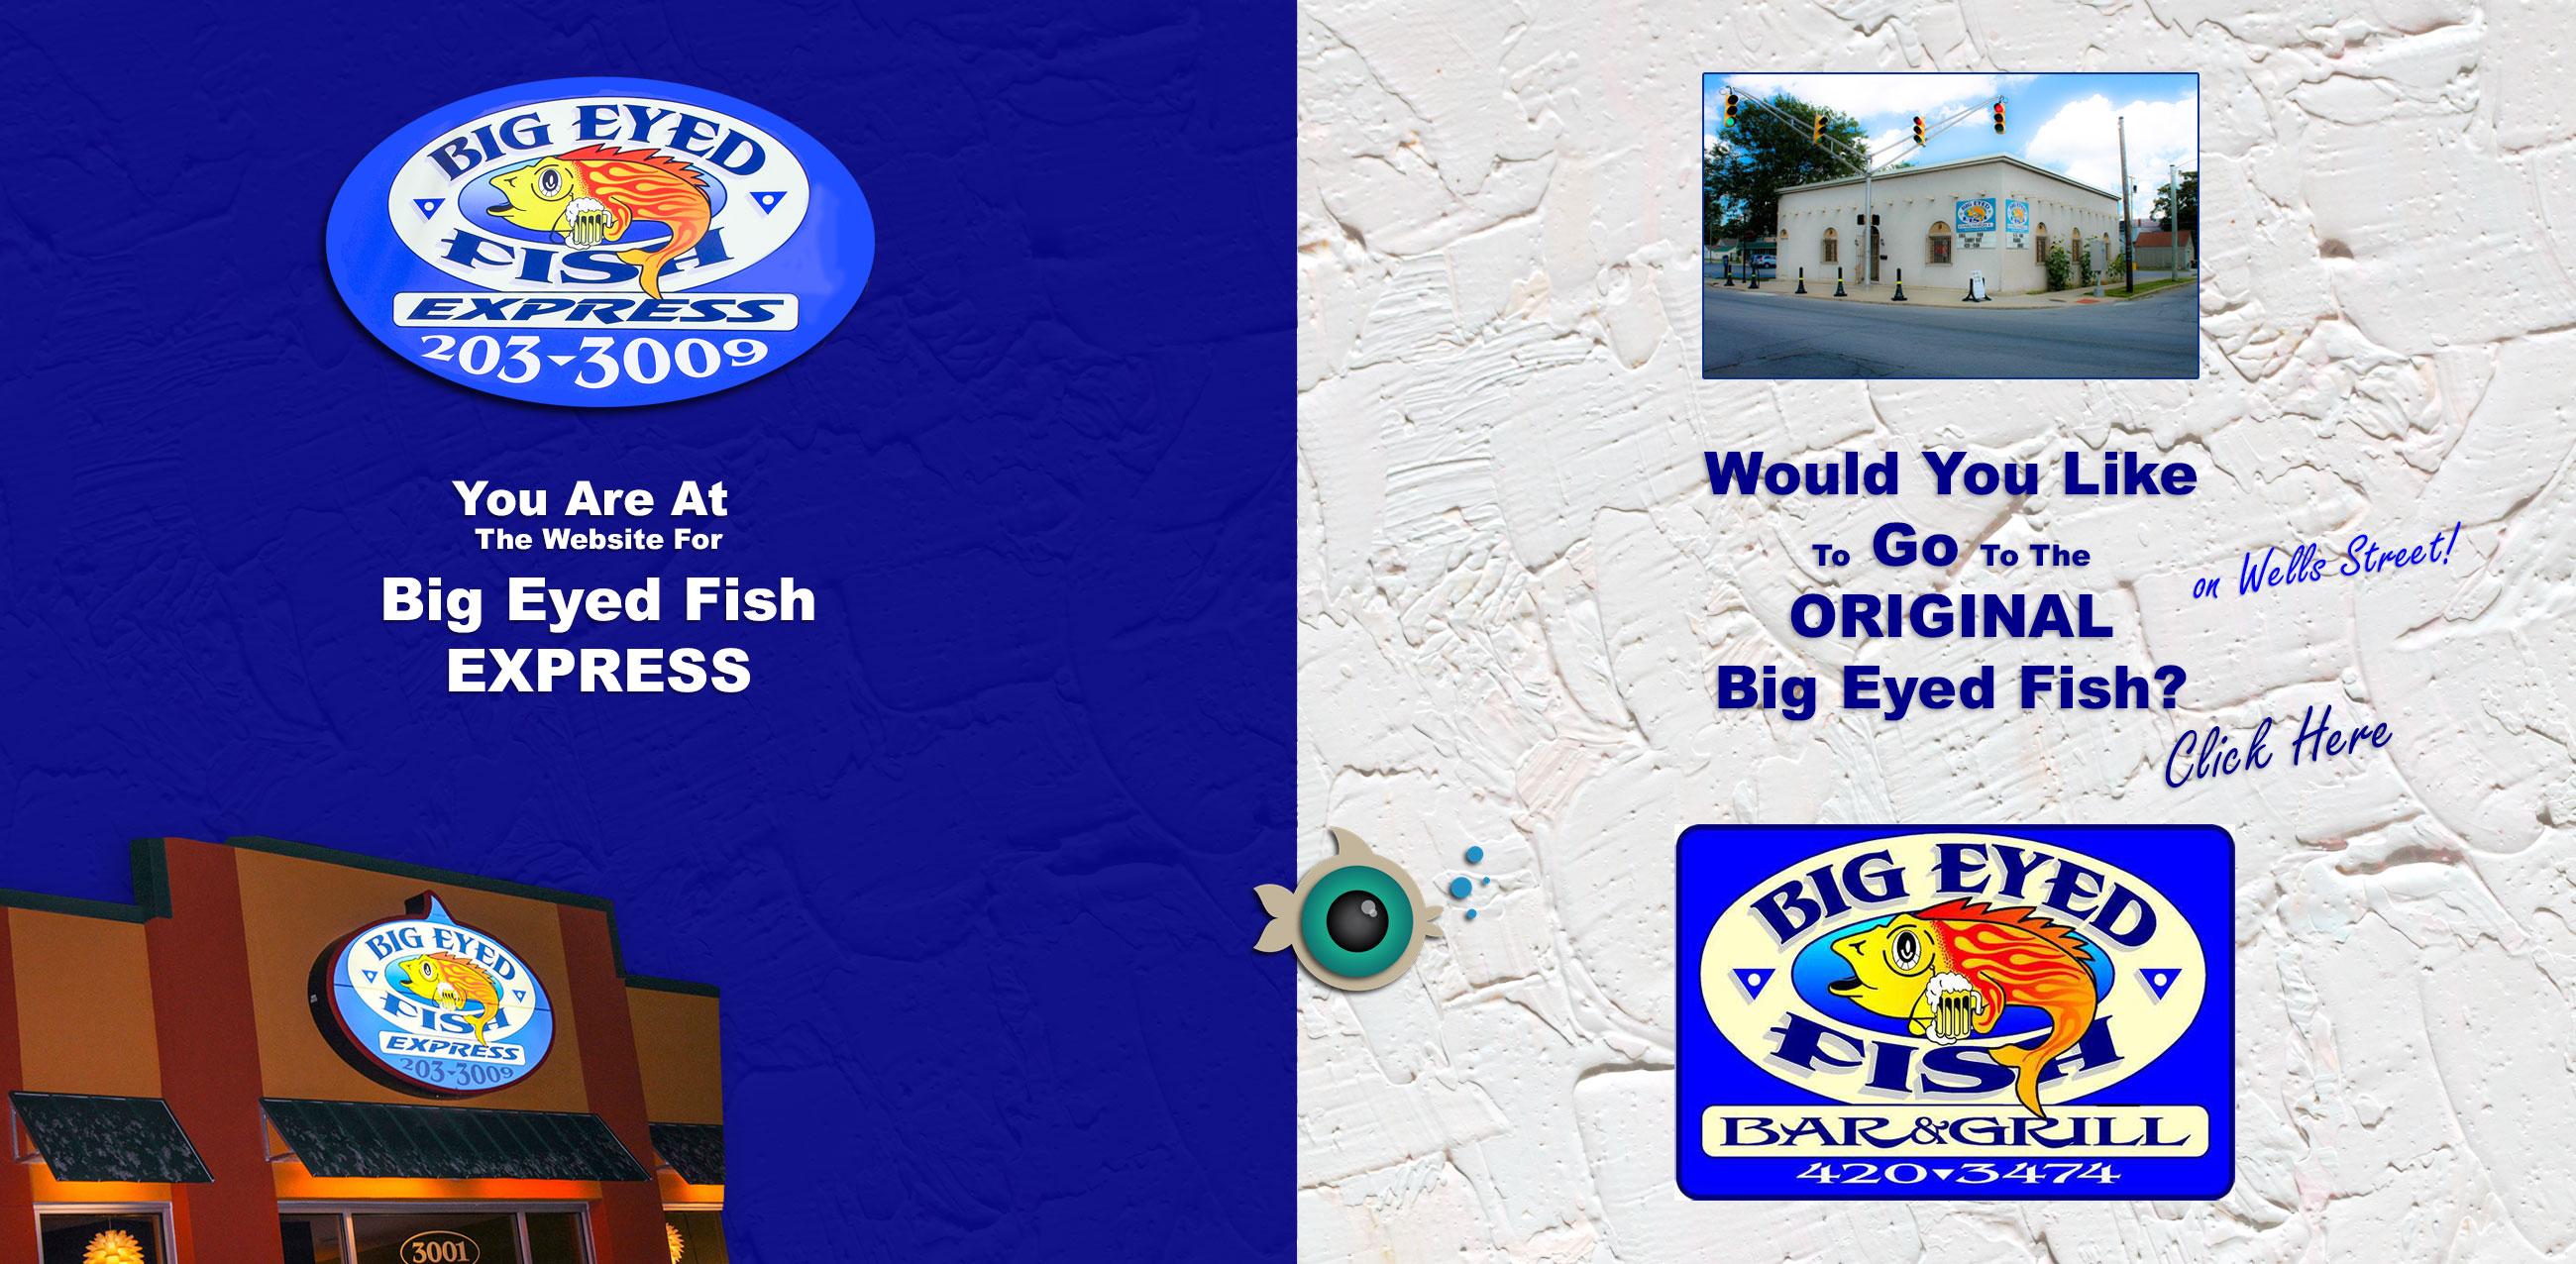 Big Eyed Fish Express